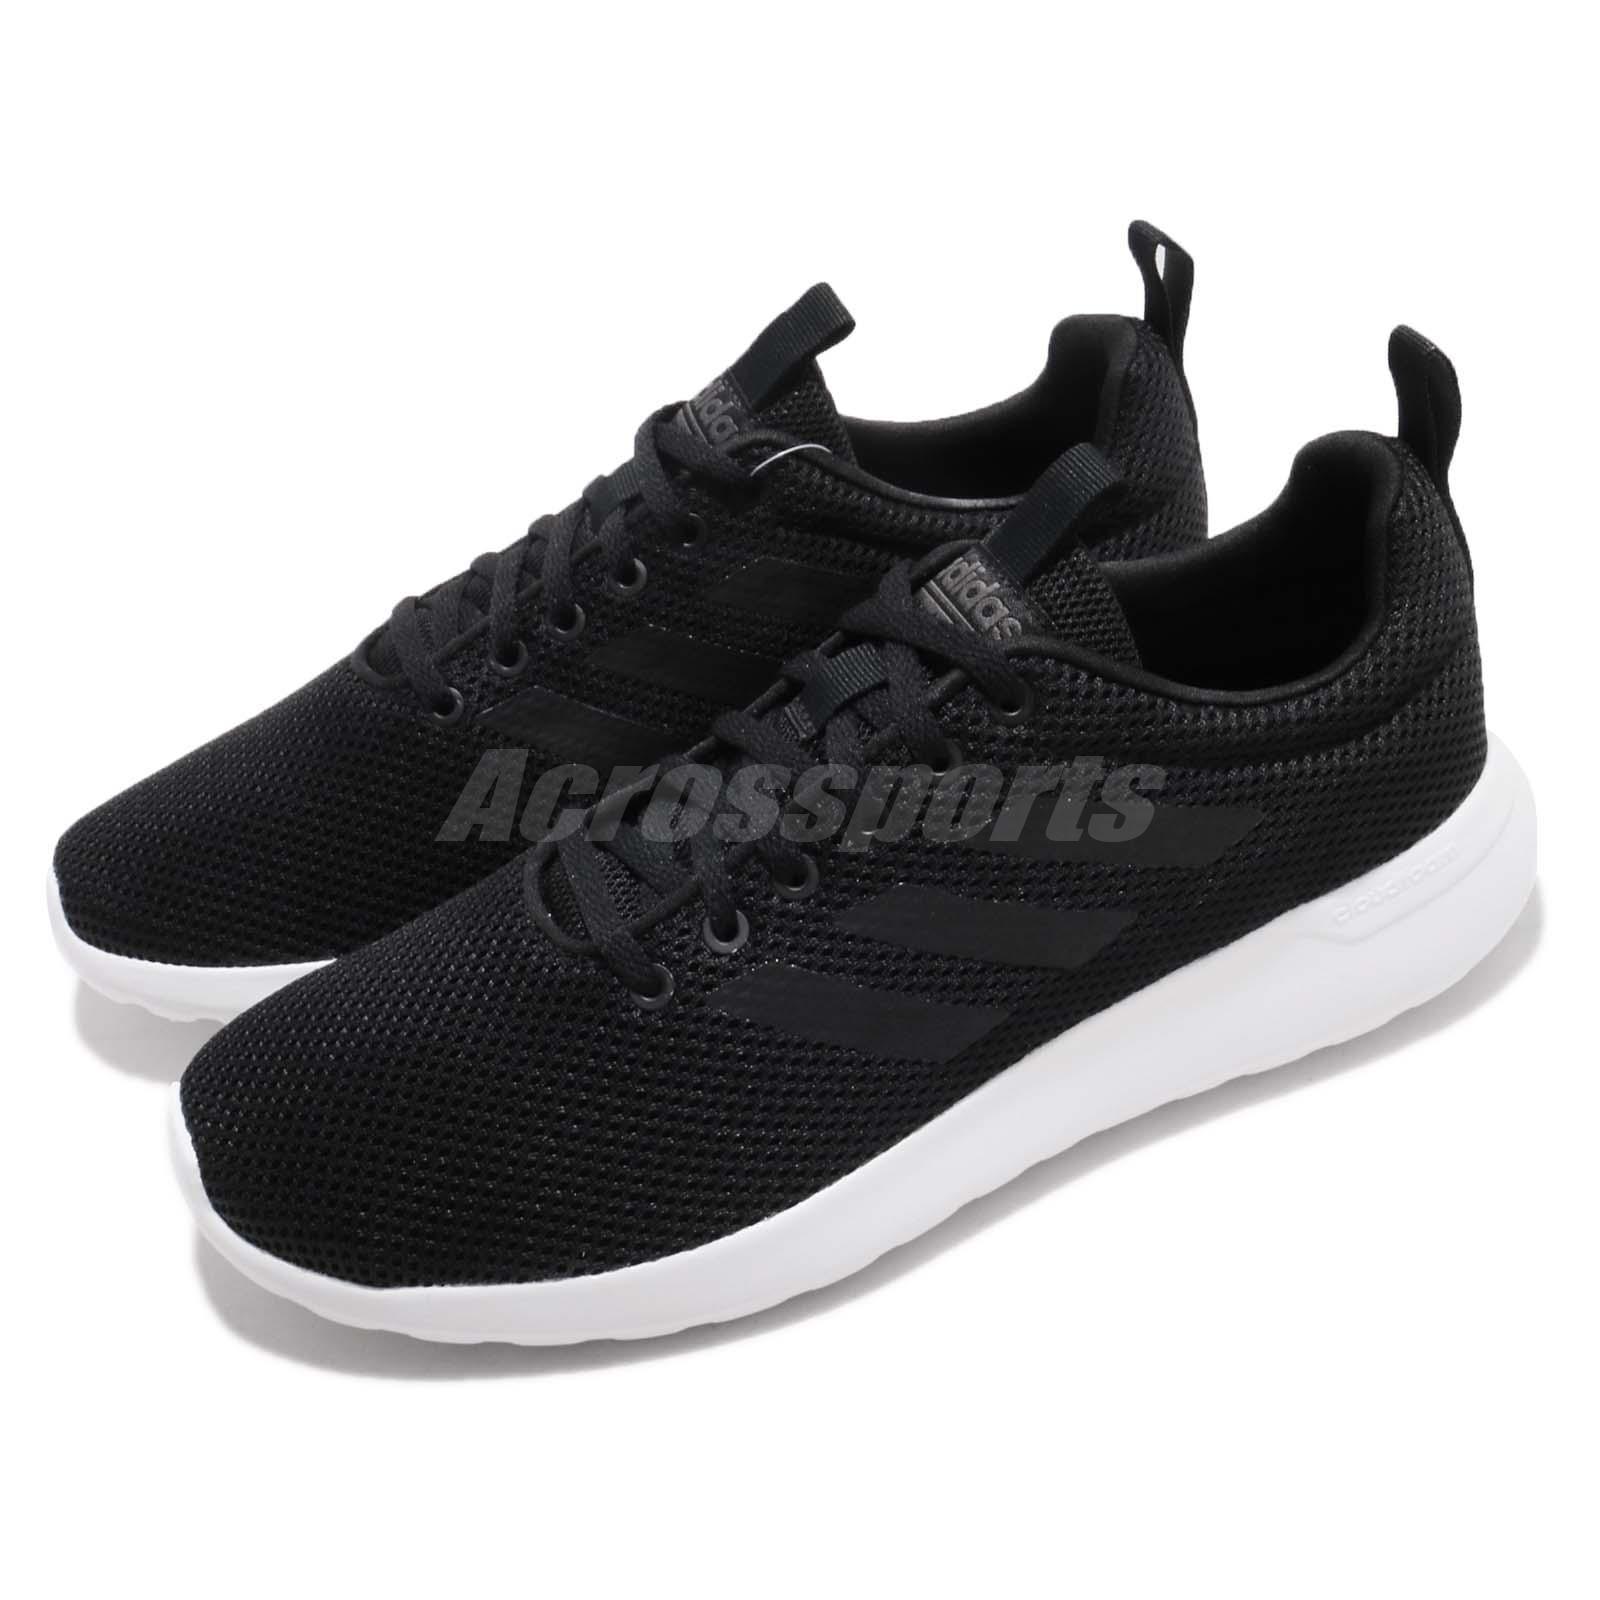 Kod kuponu sprzedaż online zaoszczędź do 80% Details about adidas Lite Racer CLN Black Carbon White Men Running Shoes  Sneakers B96569